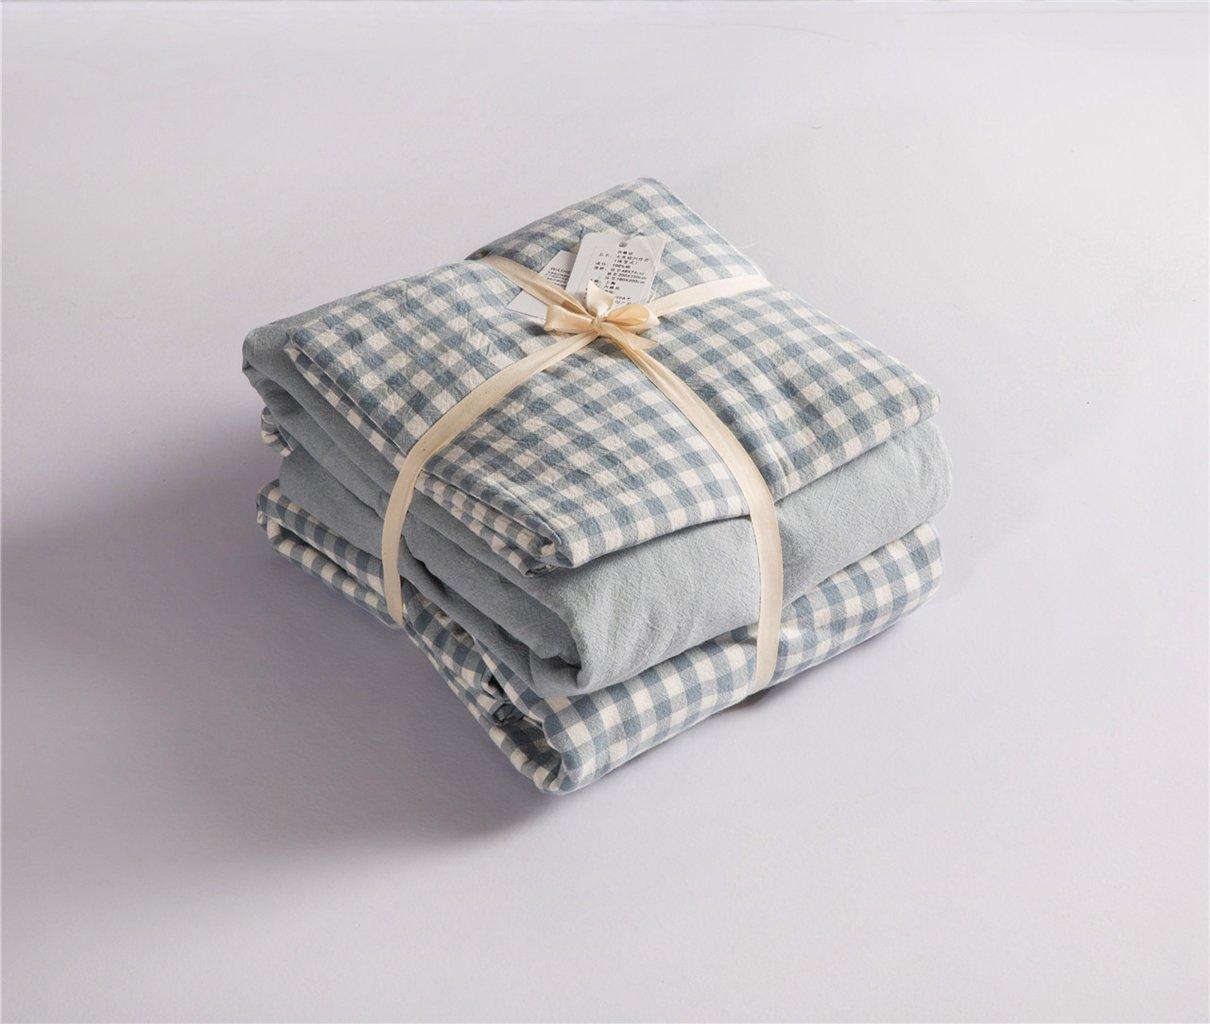 Jeanpop简璞 日式良品寝具 水洗棉床笠四件套 A类品质 婴幼儿安全标准 亲肤零刺激 1.5米床适用(蓝白格)